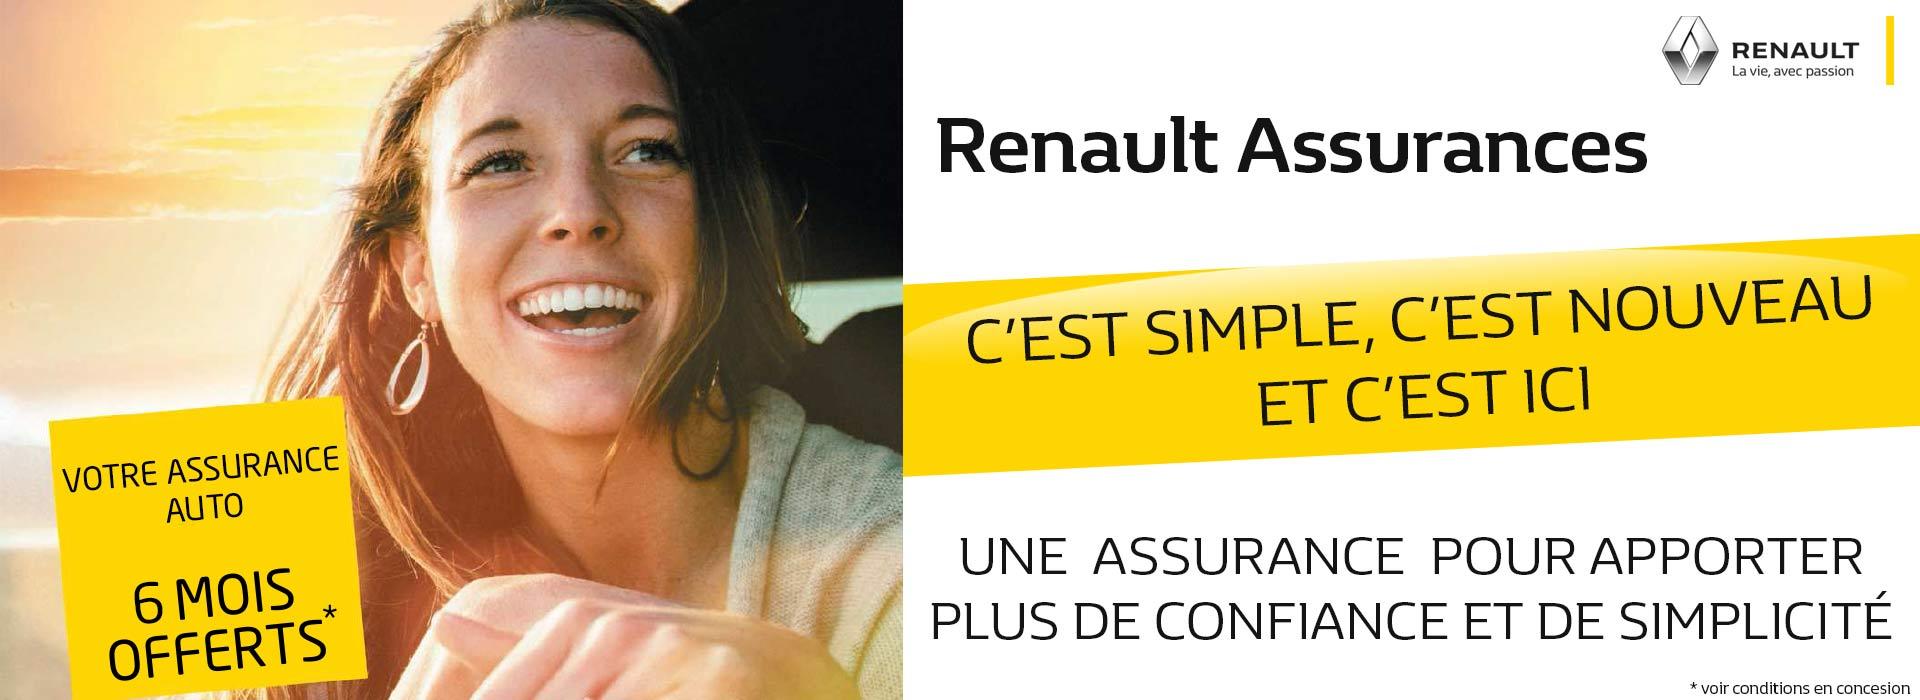 Renault Assurance